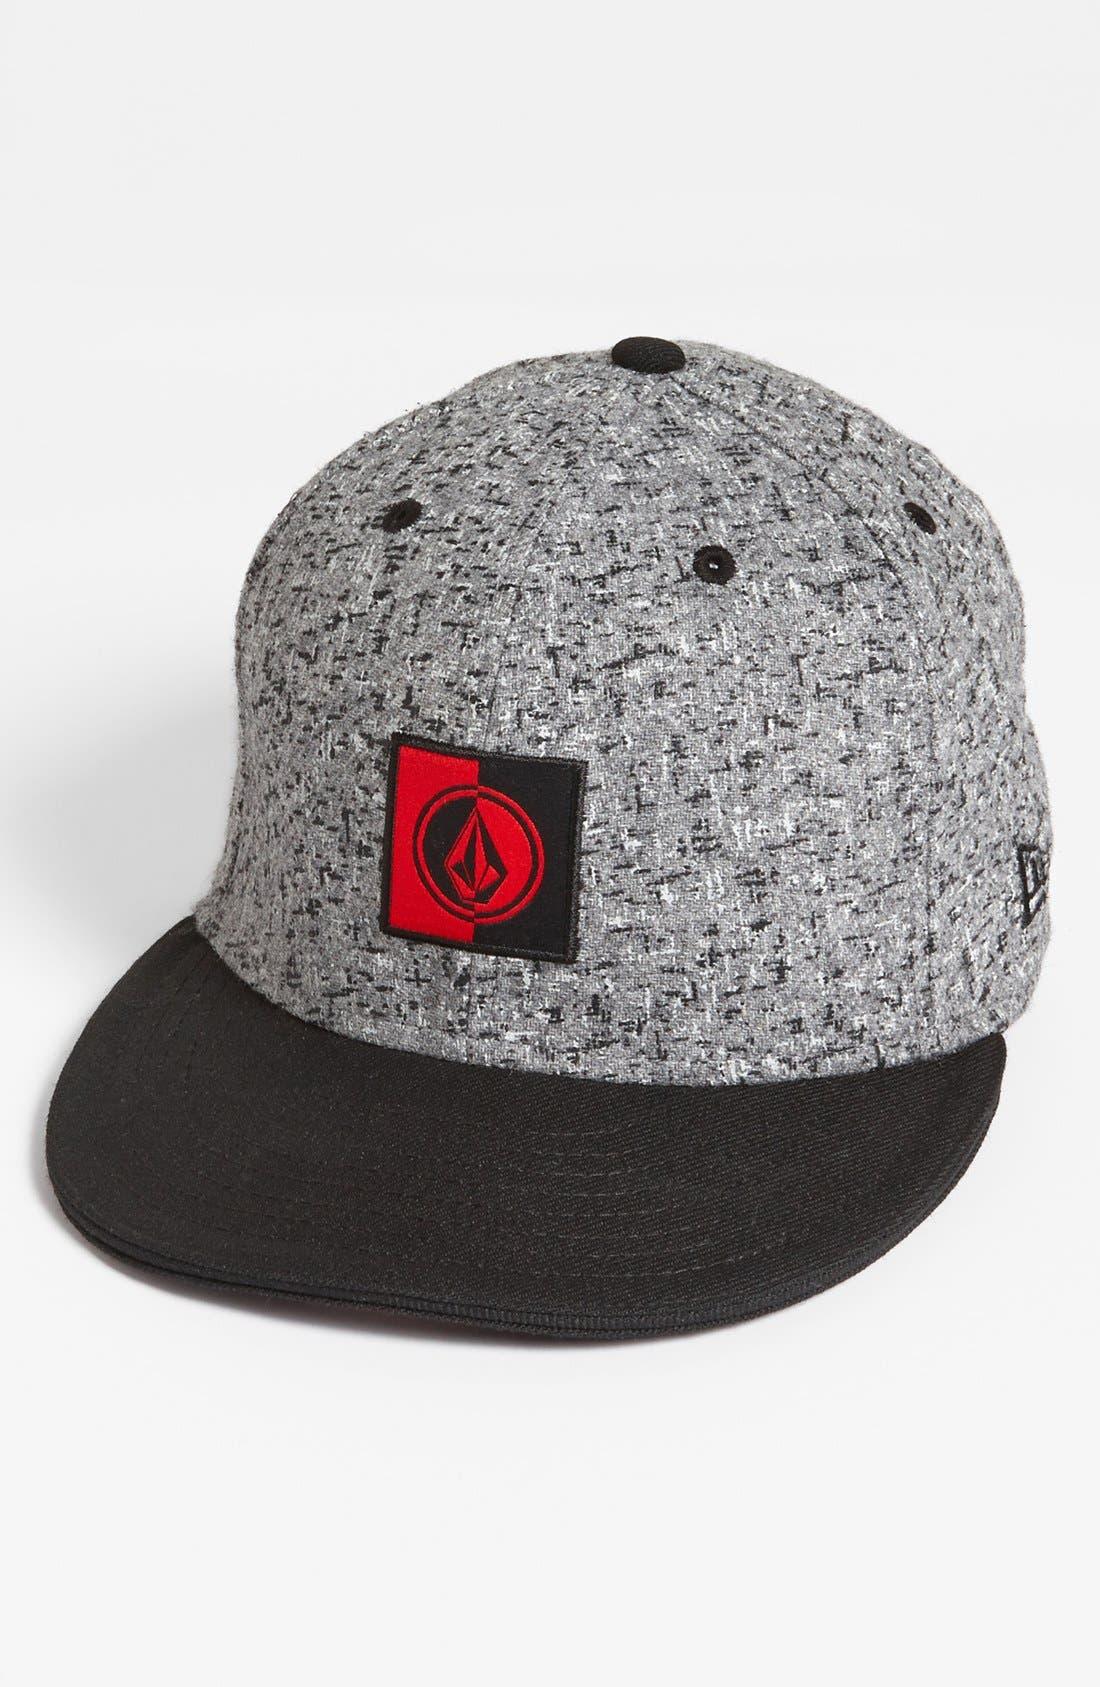 Alternate Image 1 Selected - Volcom 'Embrace' Snapback Baseball Cap